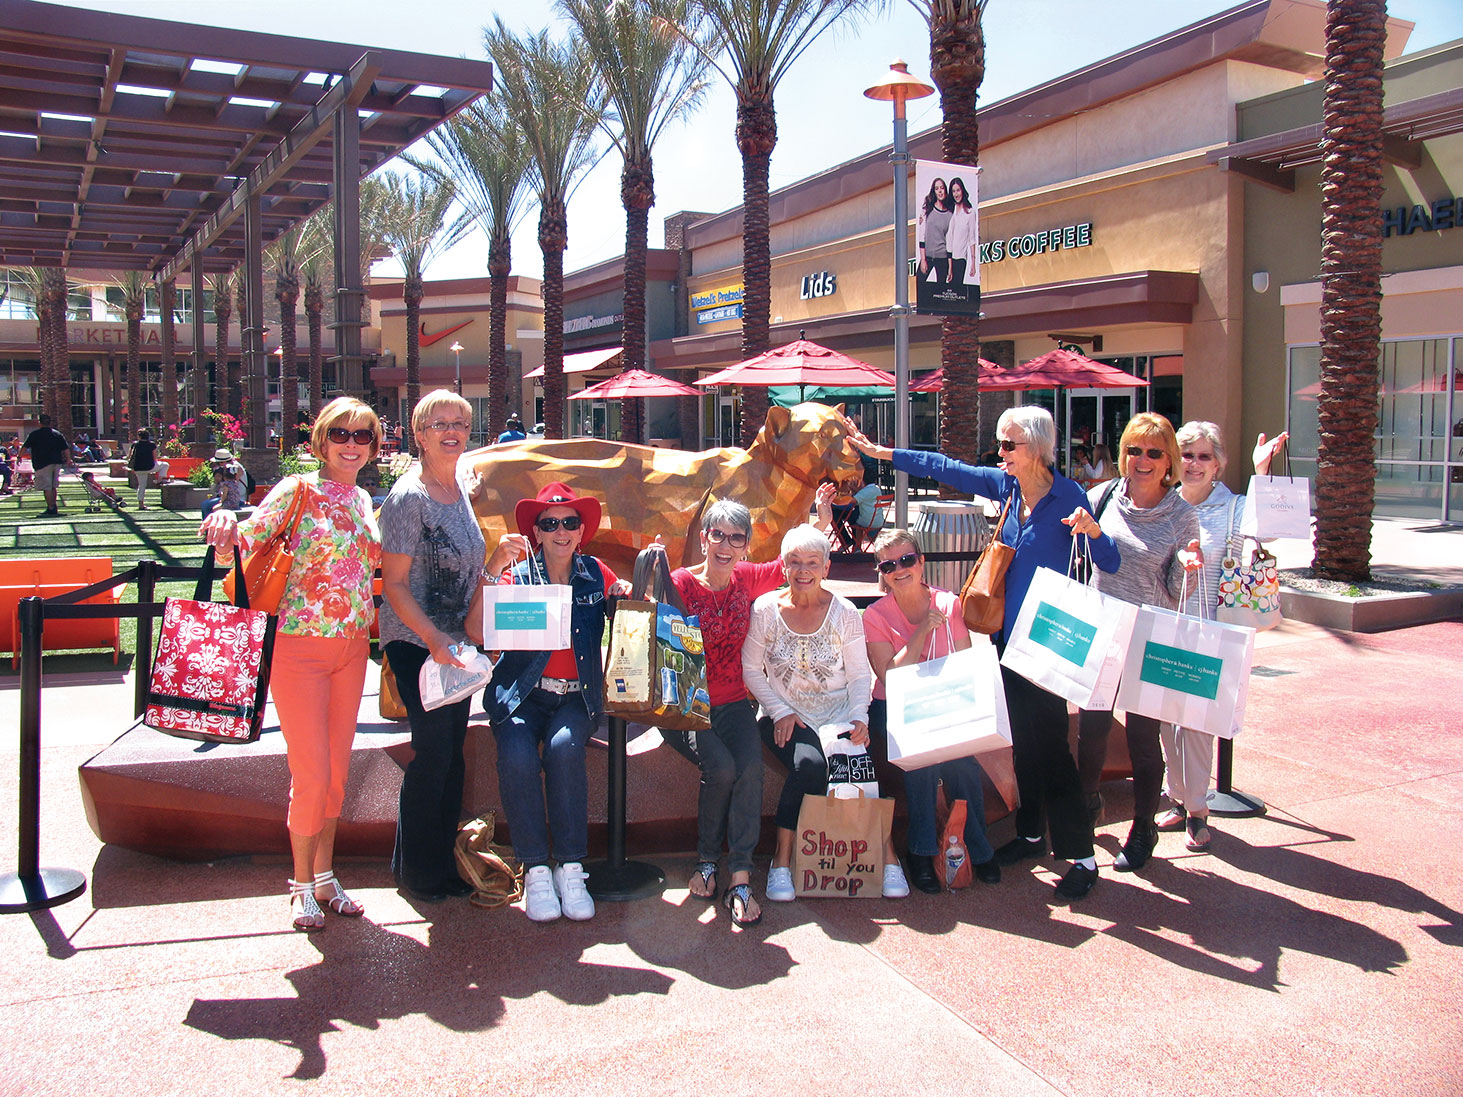 SaddleBrooke Line Dance Club at the Tucson Premium Outlets